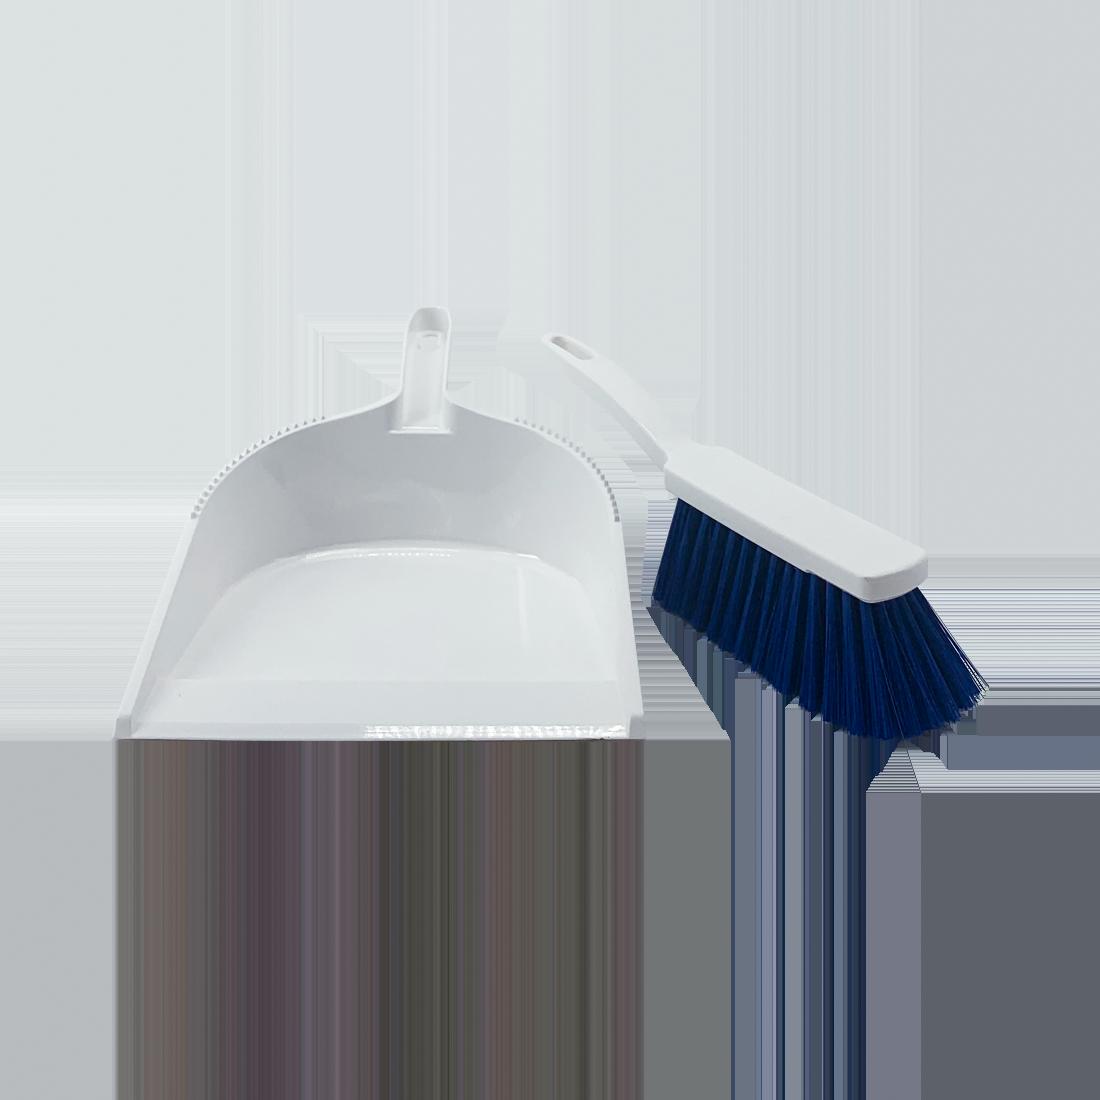 Nölle Haccp Hygiene Kehrgarnitur, blaue Borsten, weißer Körper, 33 cm